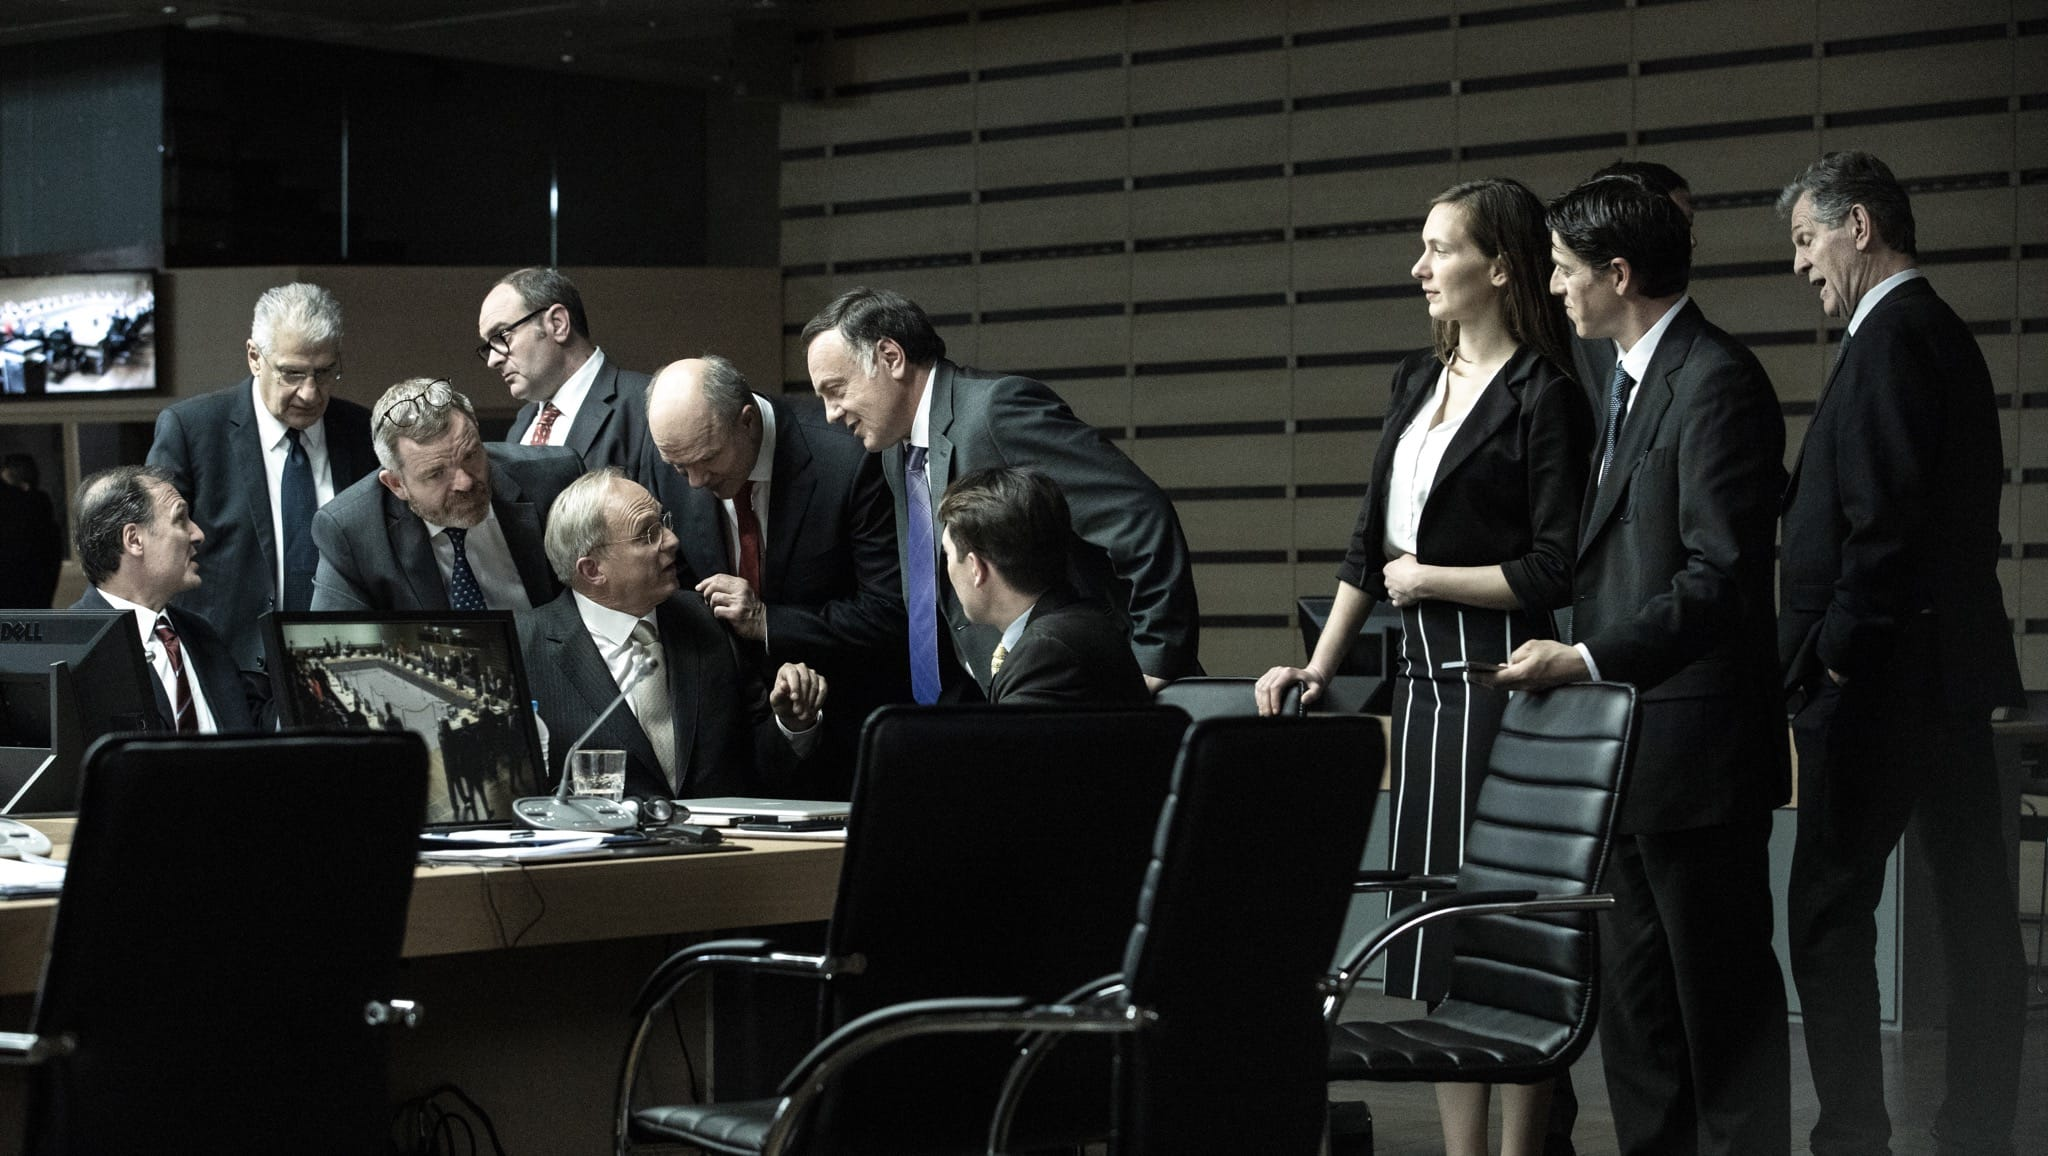 Adults in the Room de Costa-Gavras image film cinéma